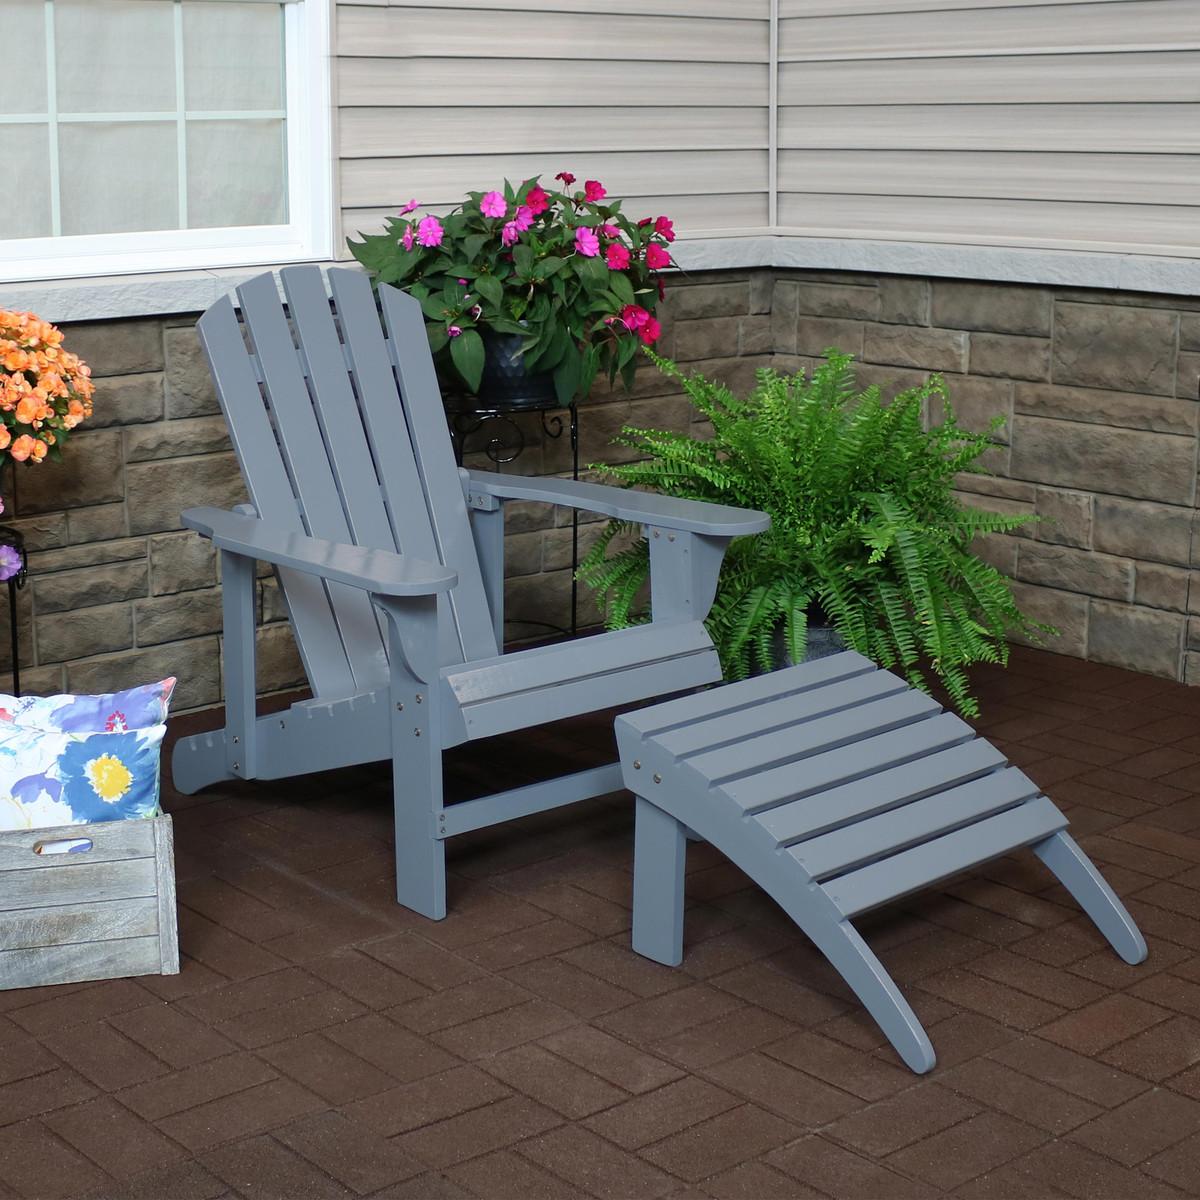 Miraculous Sunnydaze Wooden Outdoor Adirondack Chair With Adjustable Machost Co Dining Chair Design Ideas Machostcouk